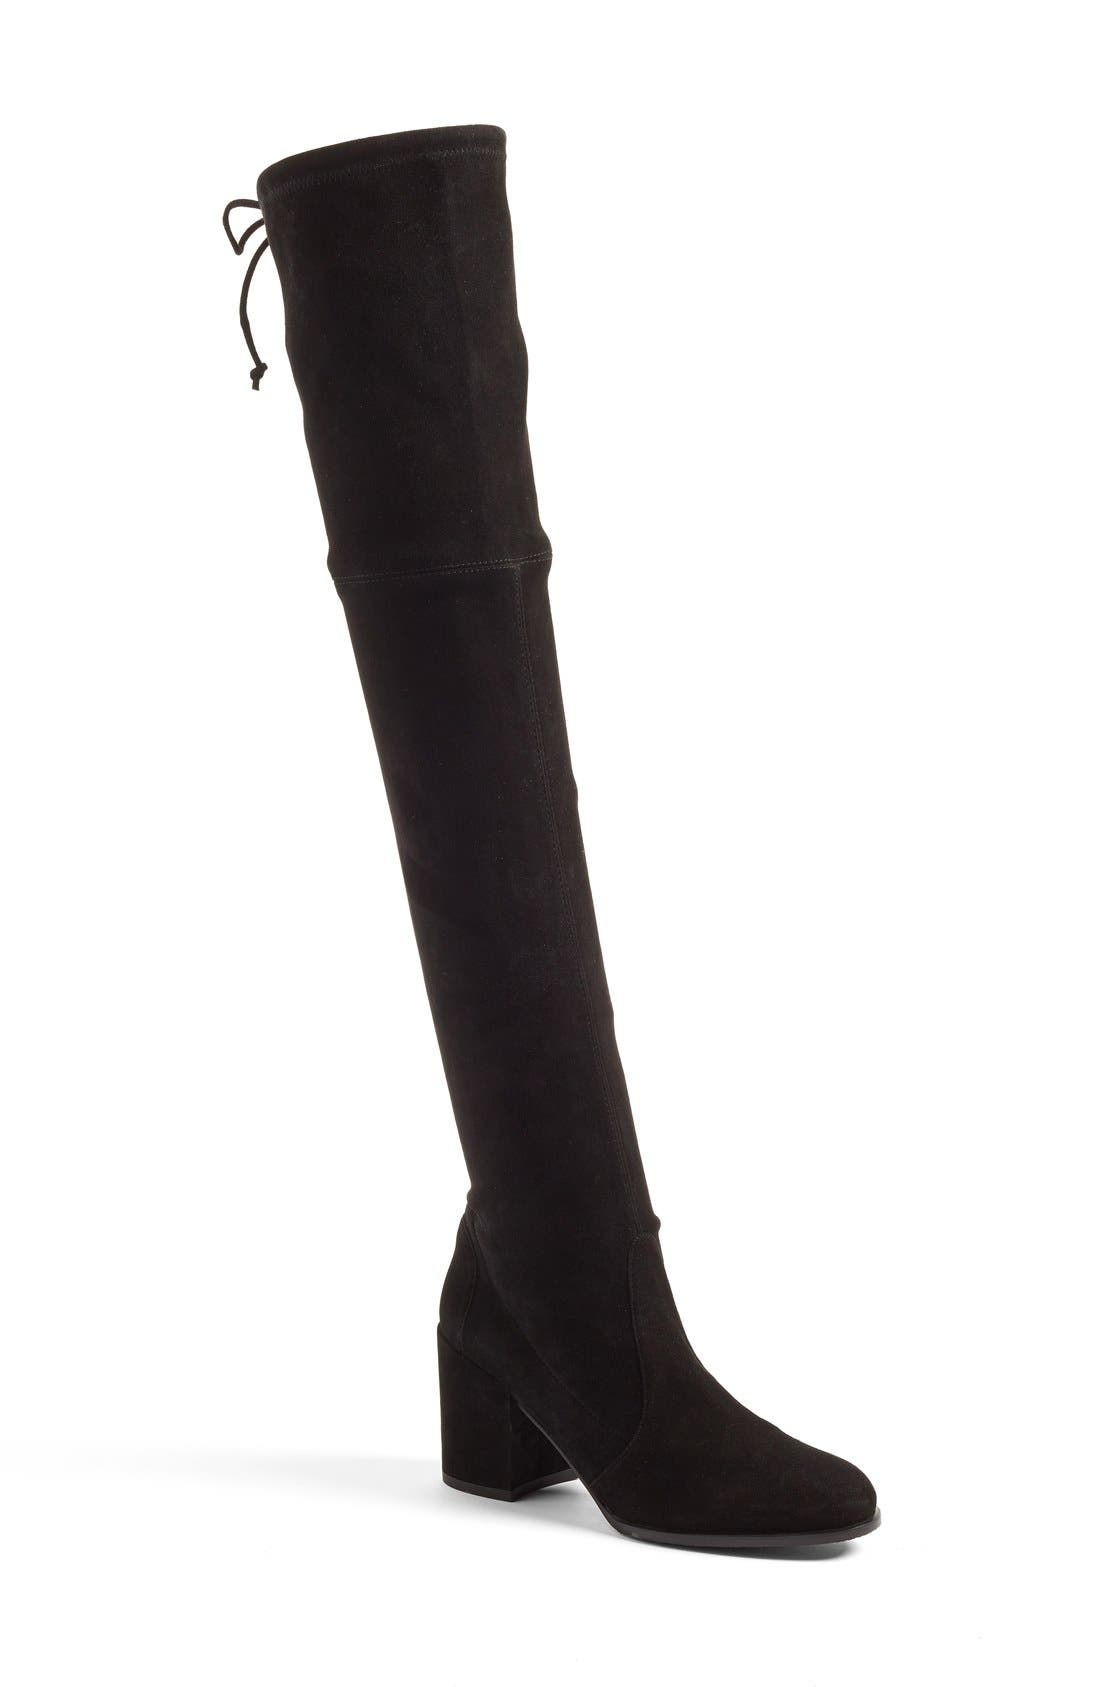 STUART WEITZMAN Tieland Over the Knee Boot, Main, color, BLACK SUEDE